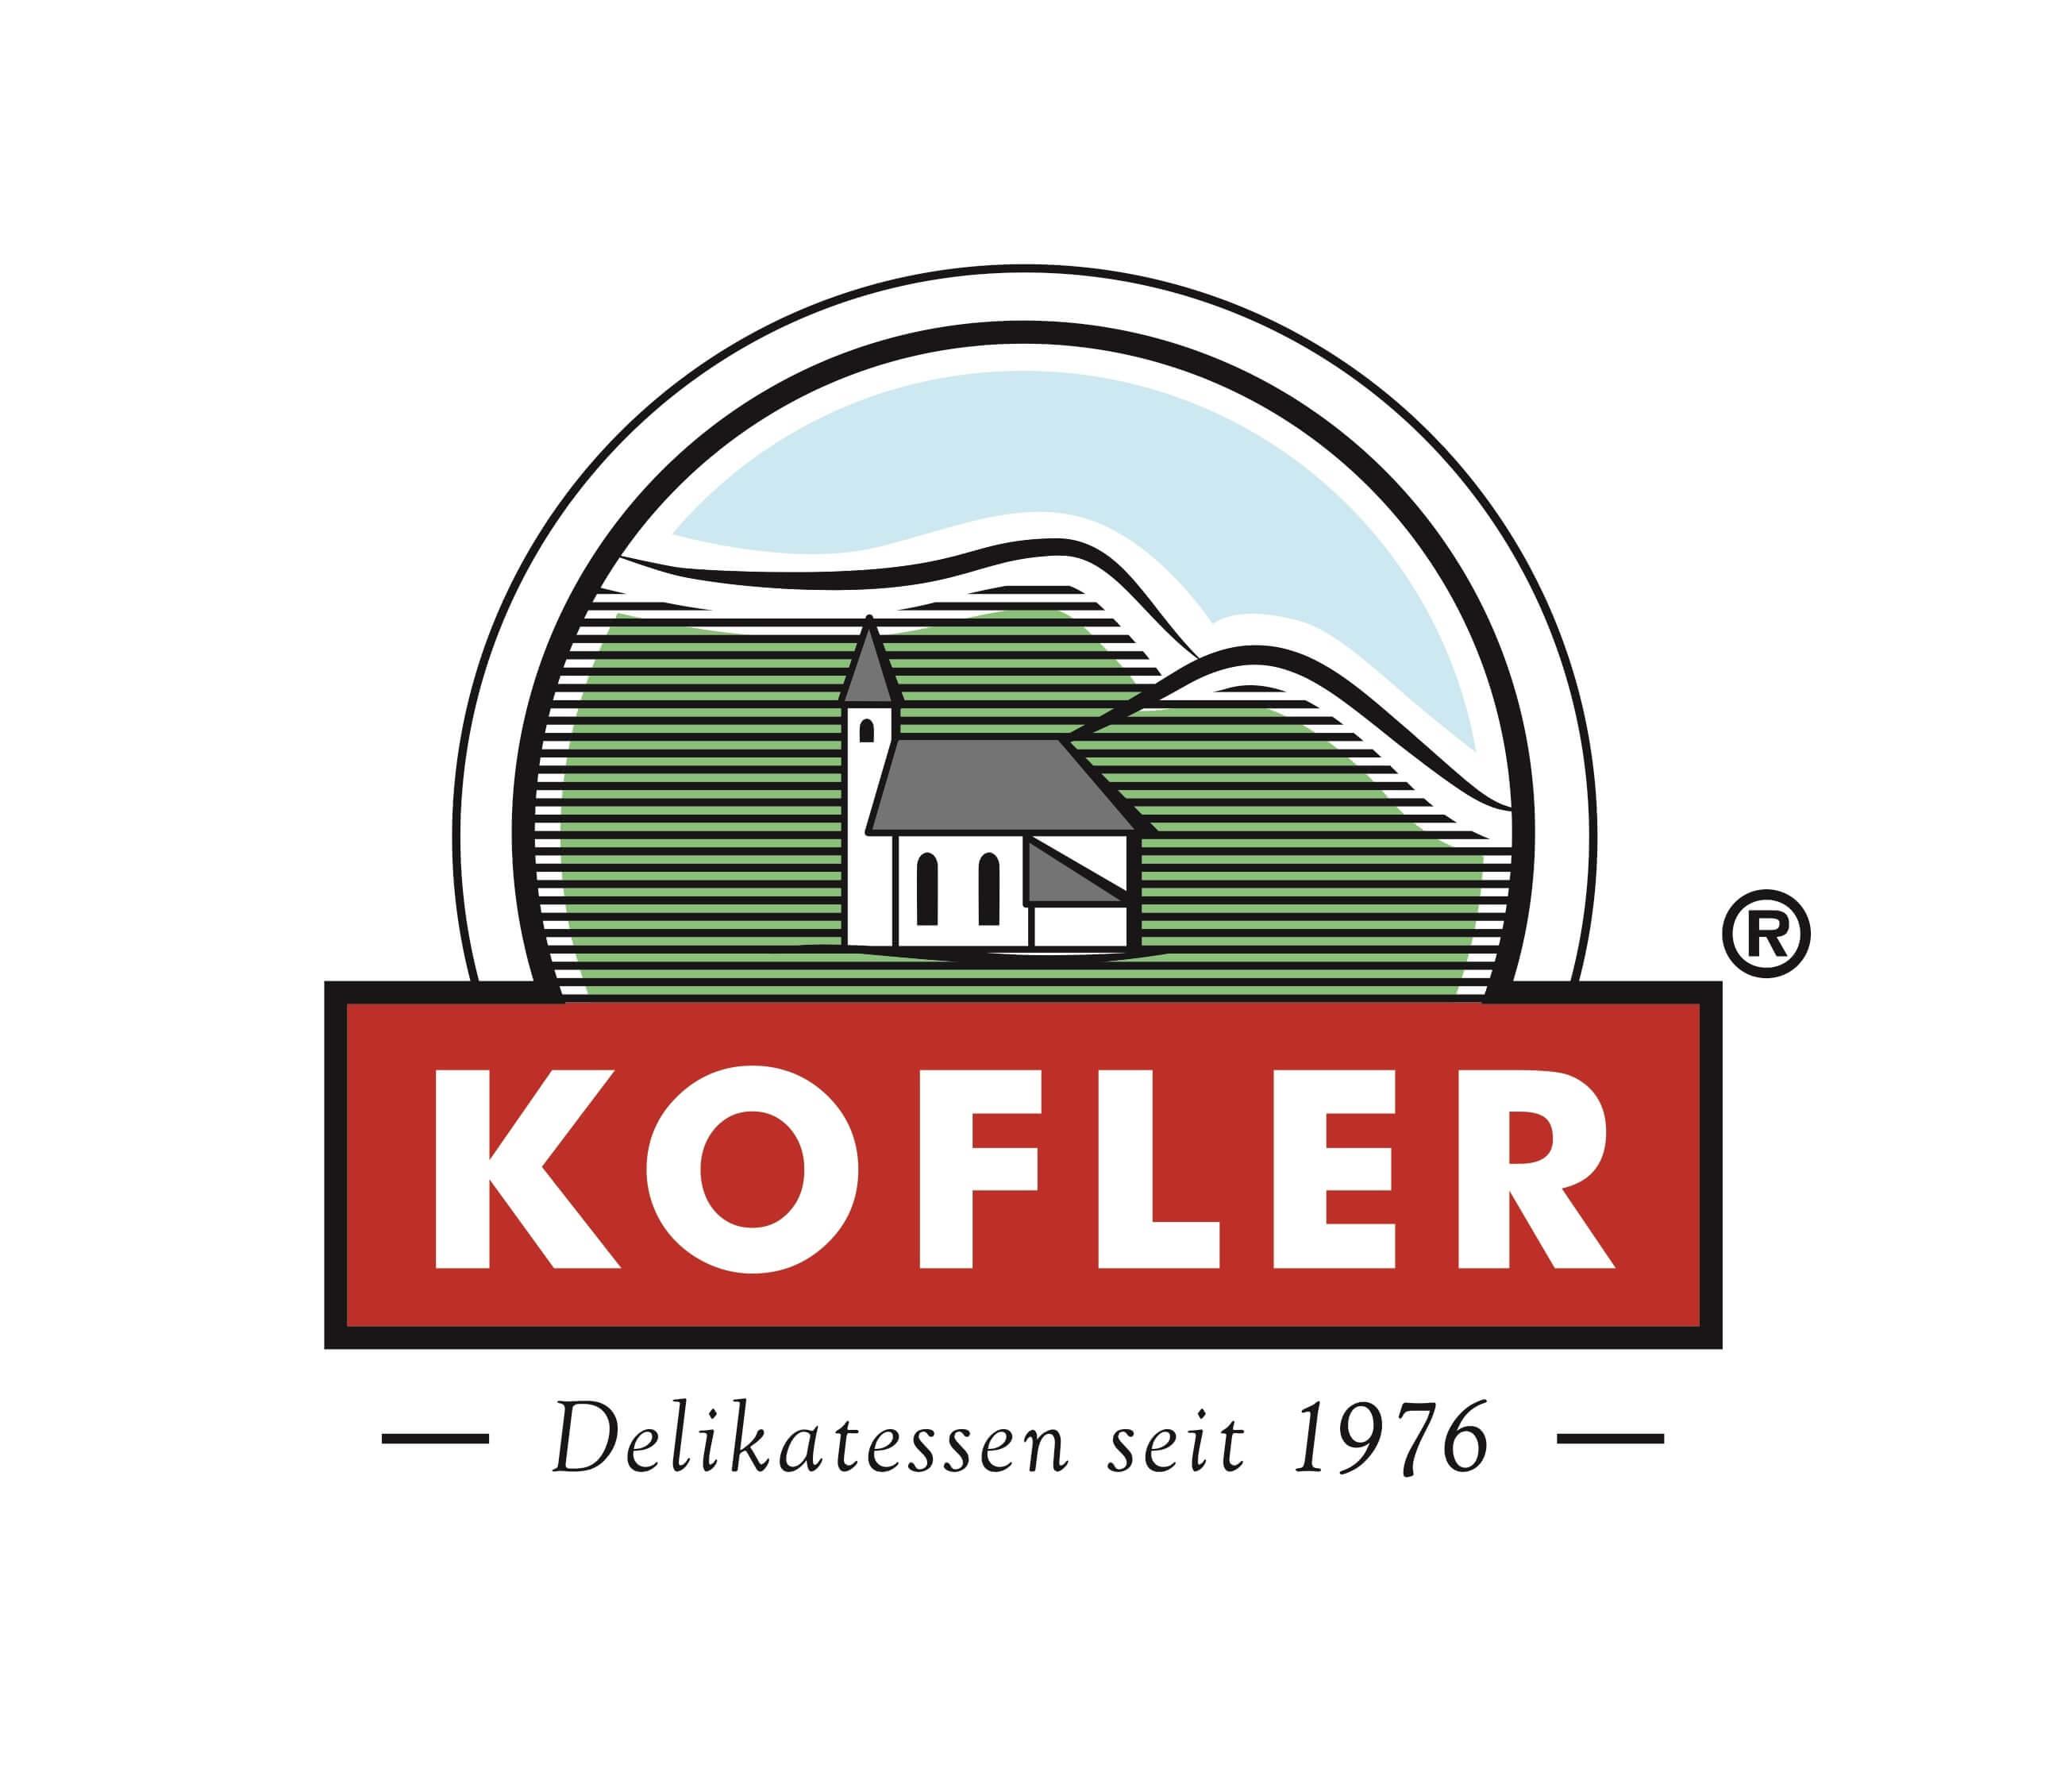 Kofler Delikatessen GmbH